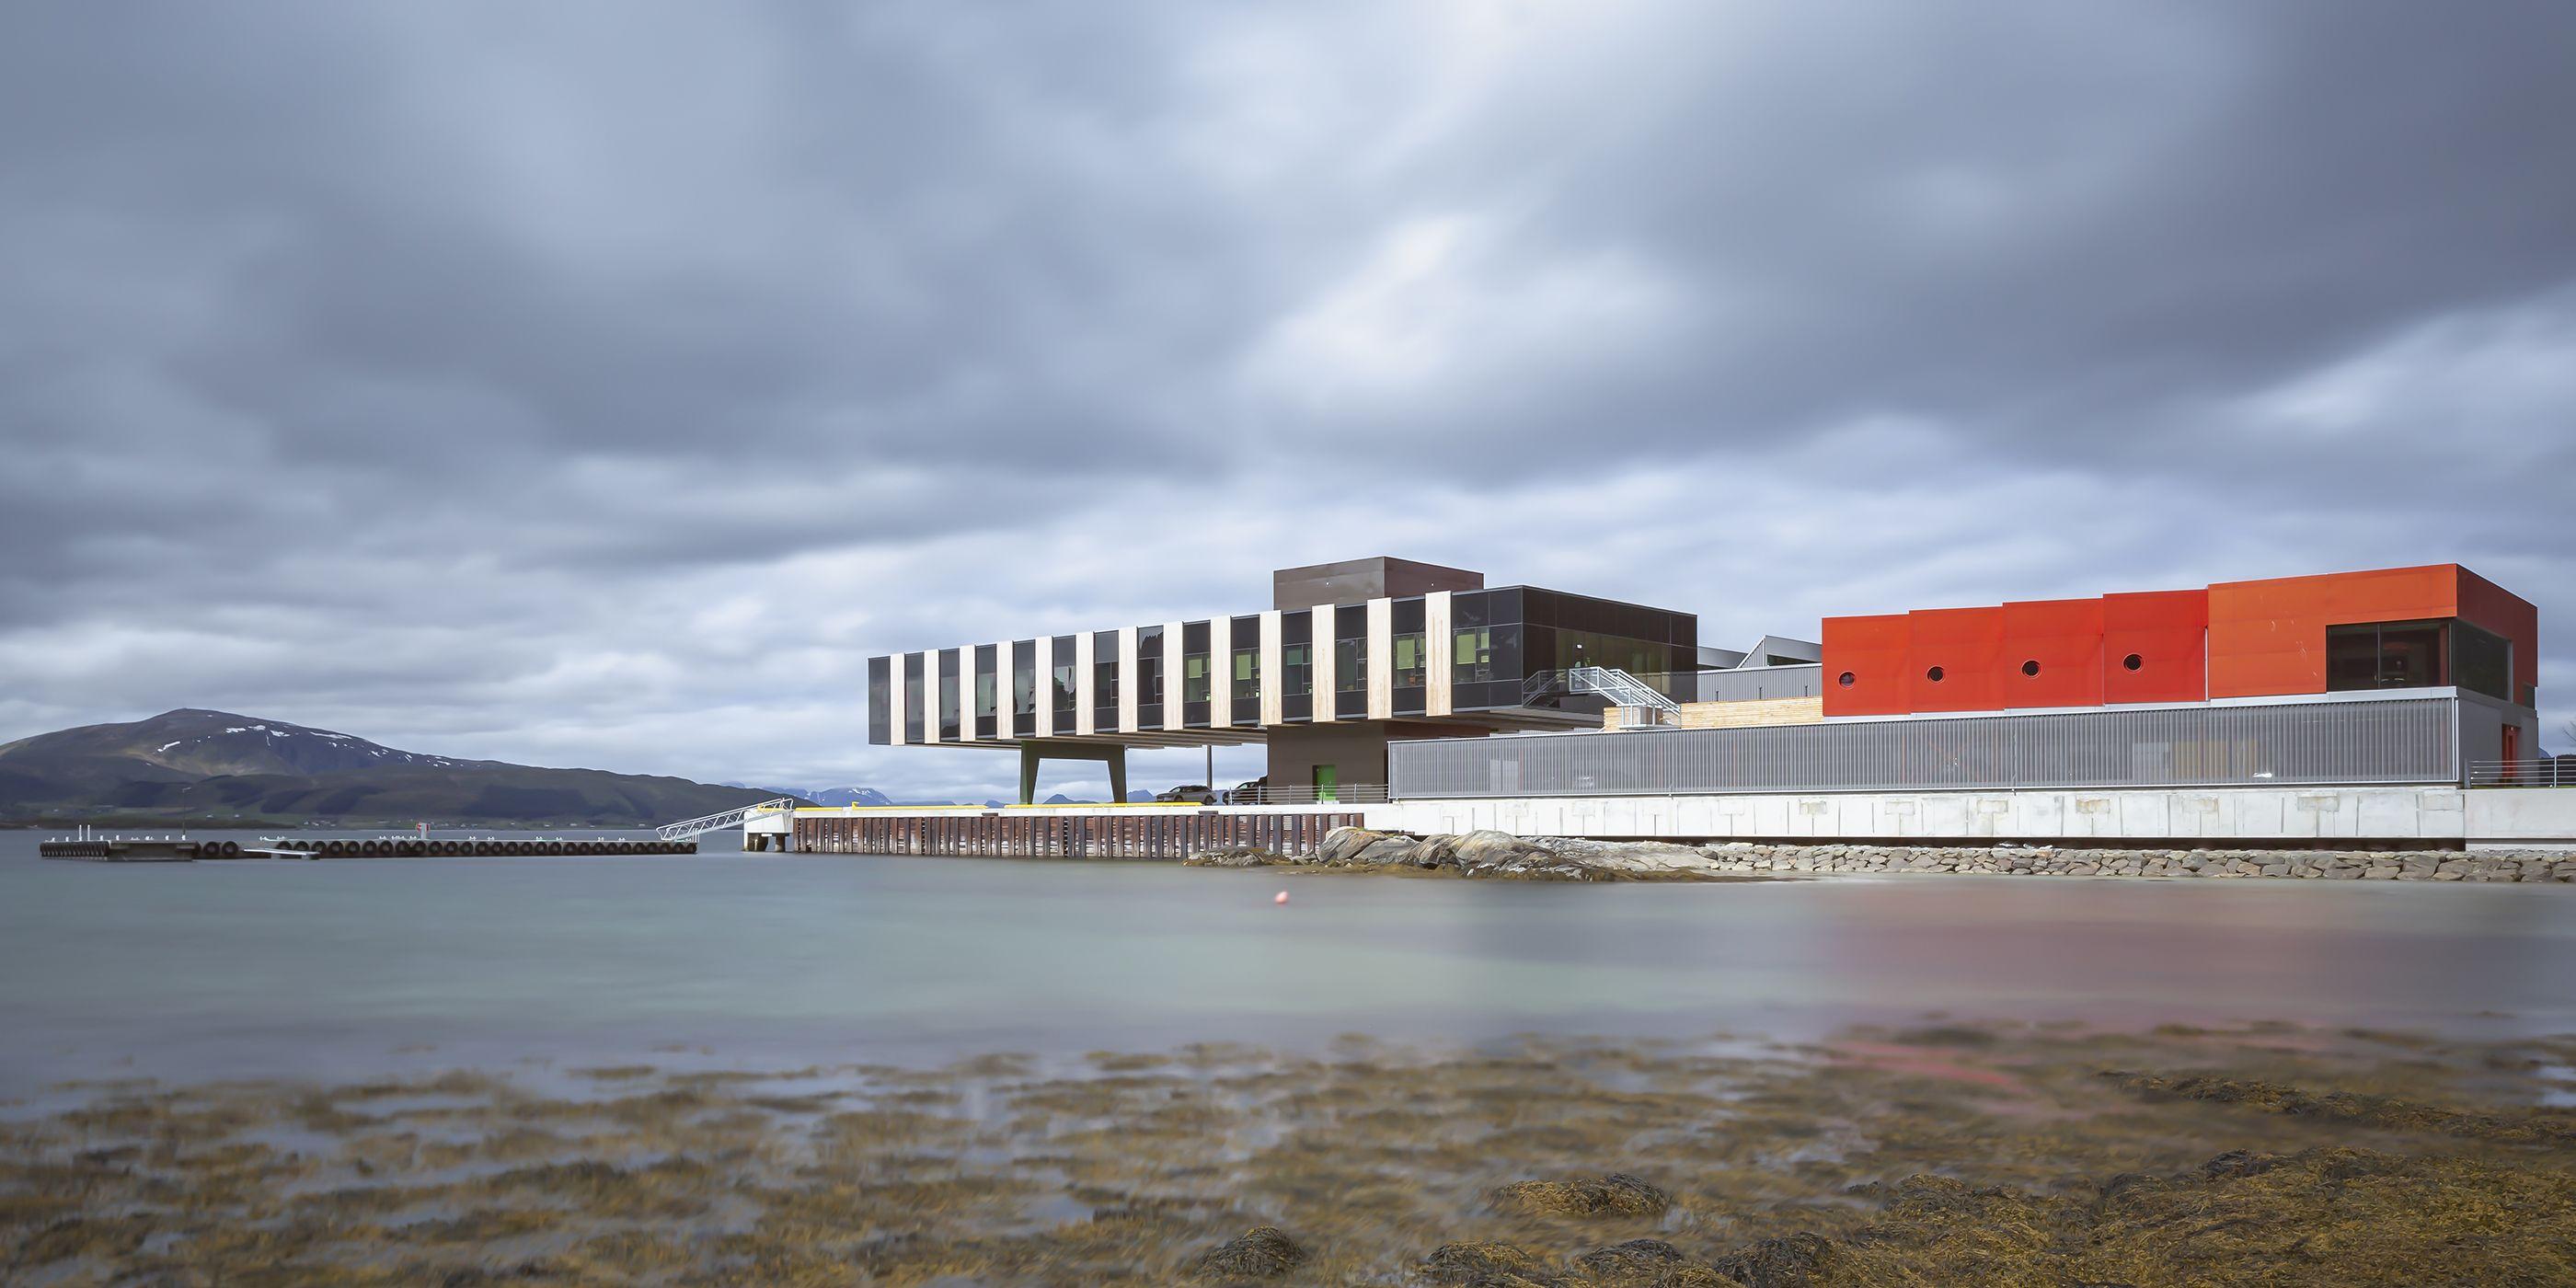 Holmøy Maritime, Snøetta, Holmen, arcipelago di Vesterålen, Norvegia